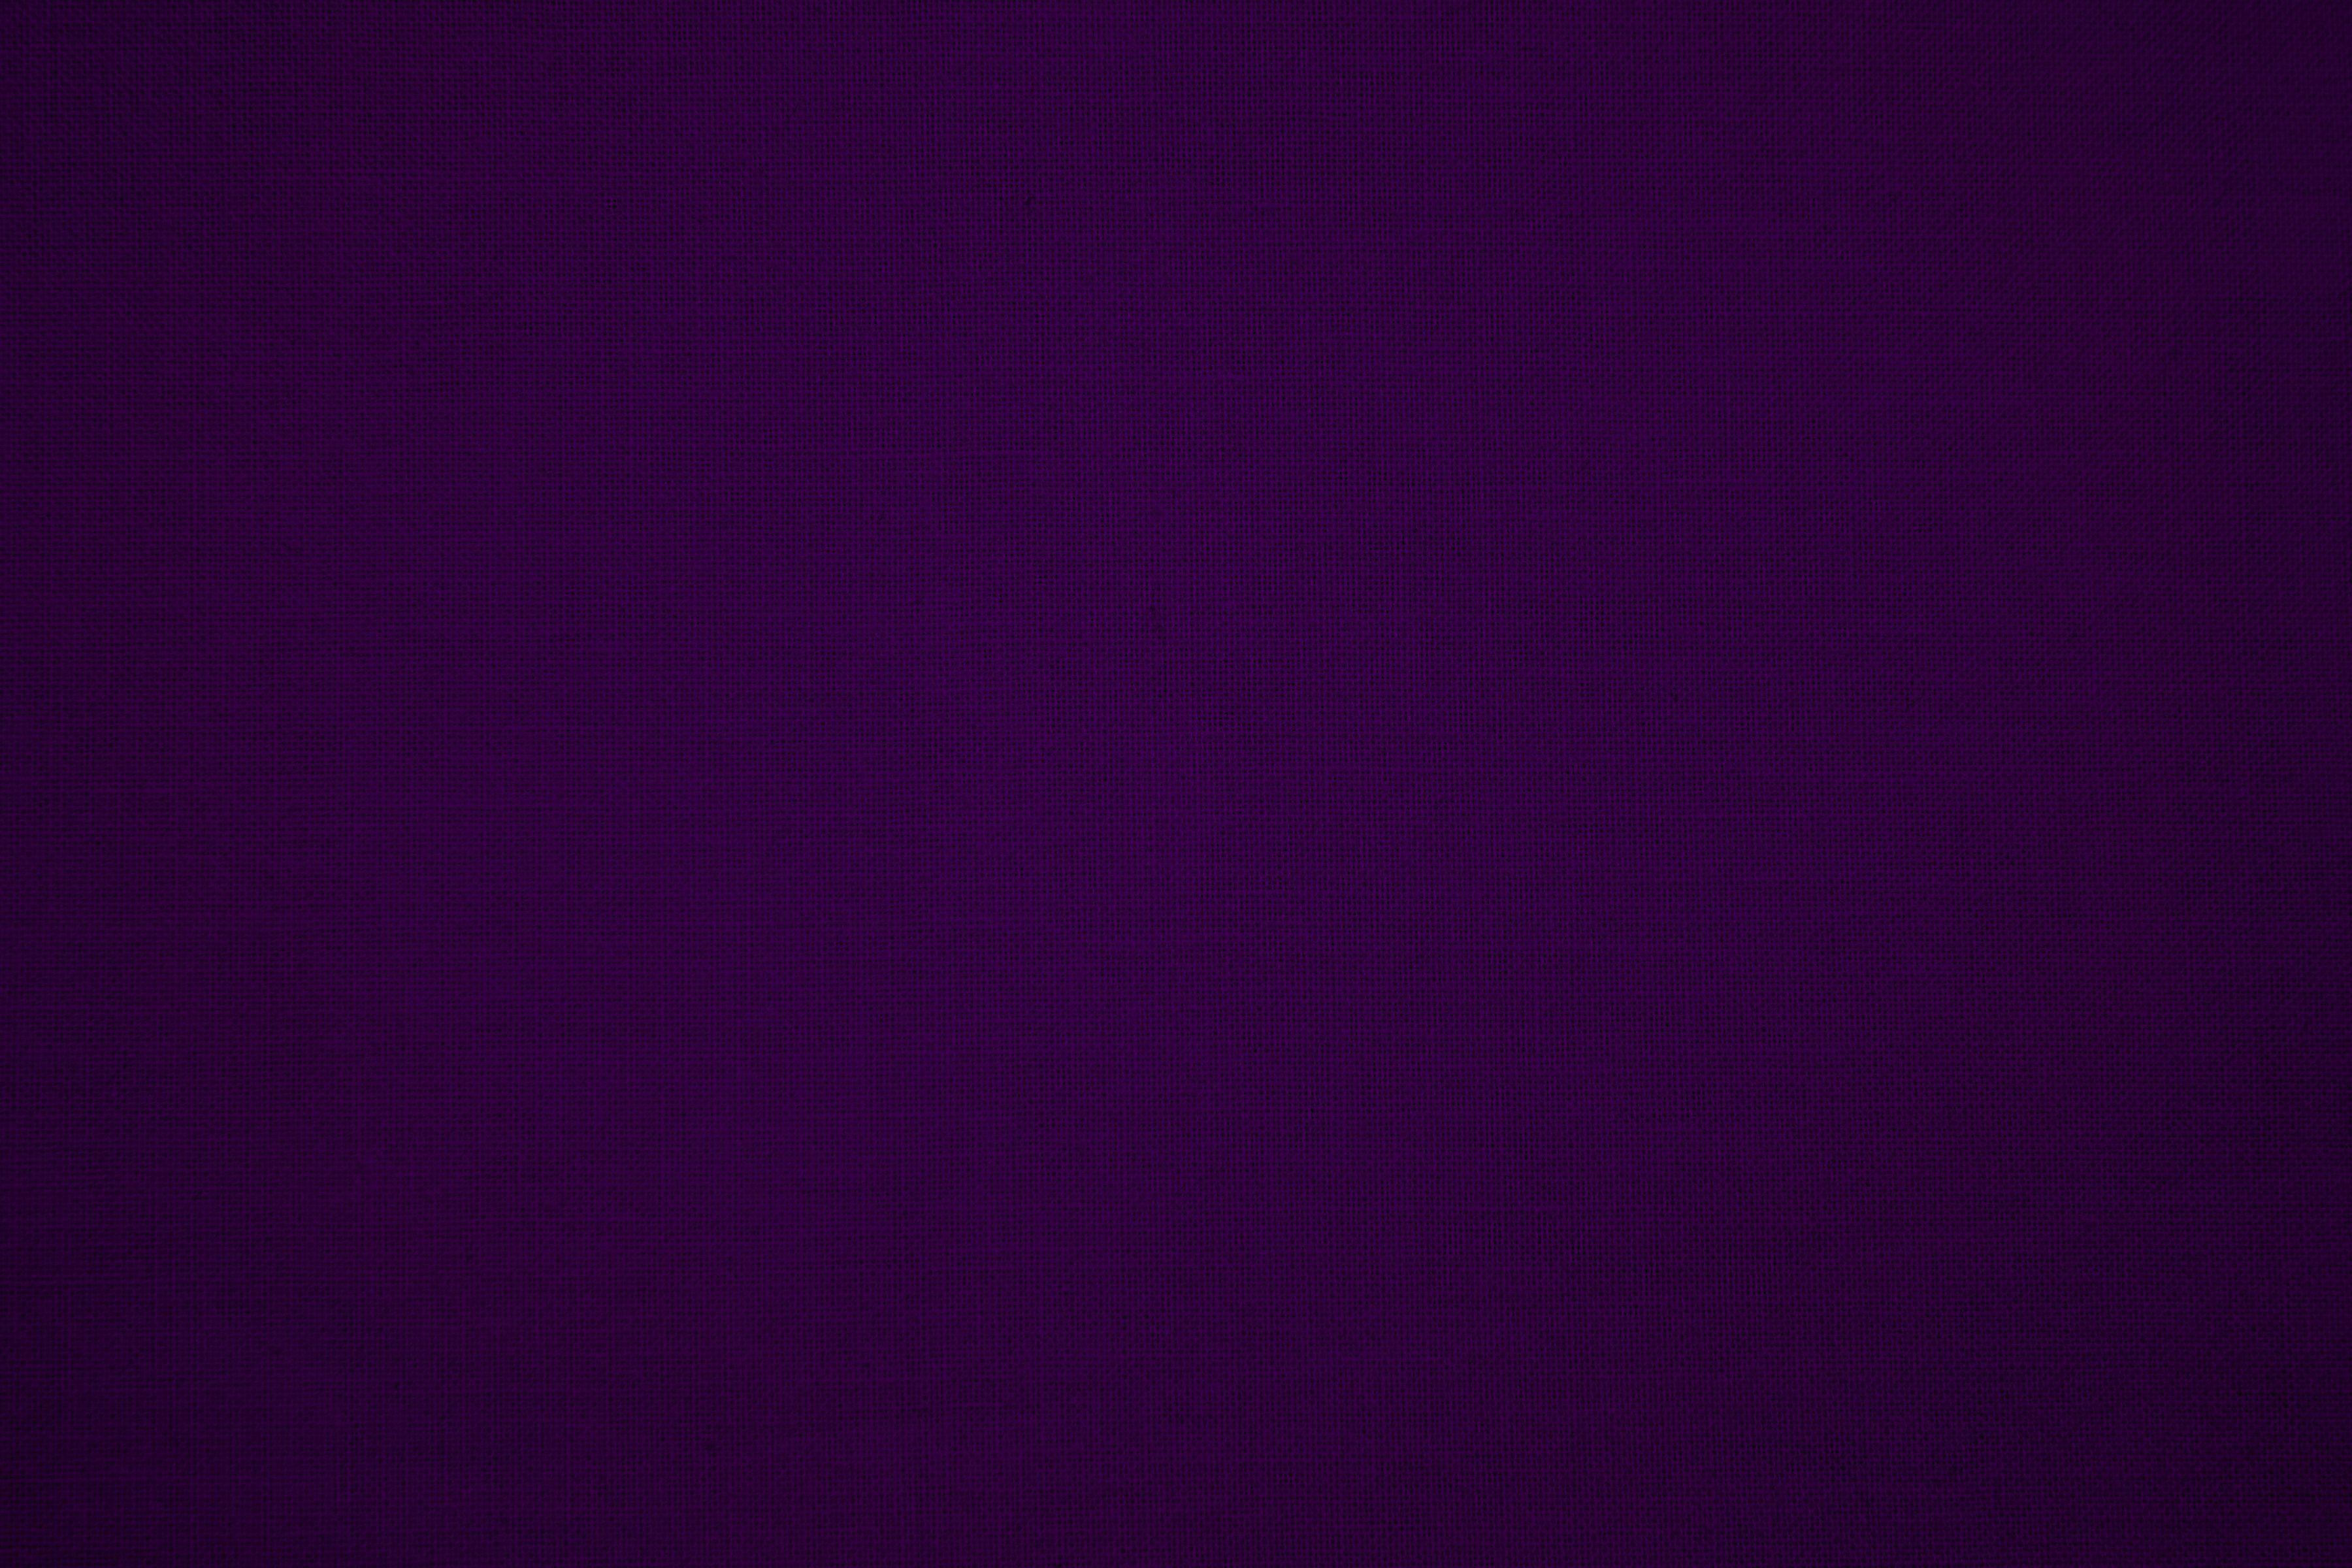 Dark Purple Backgrounds WallpaperSafari